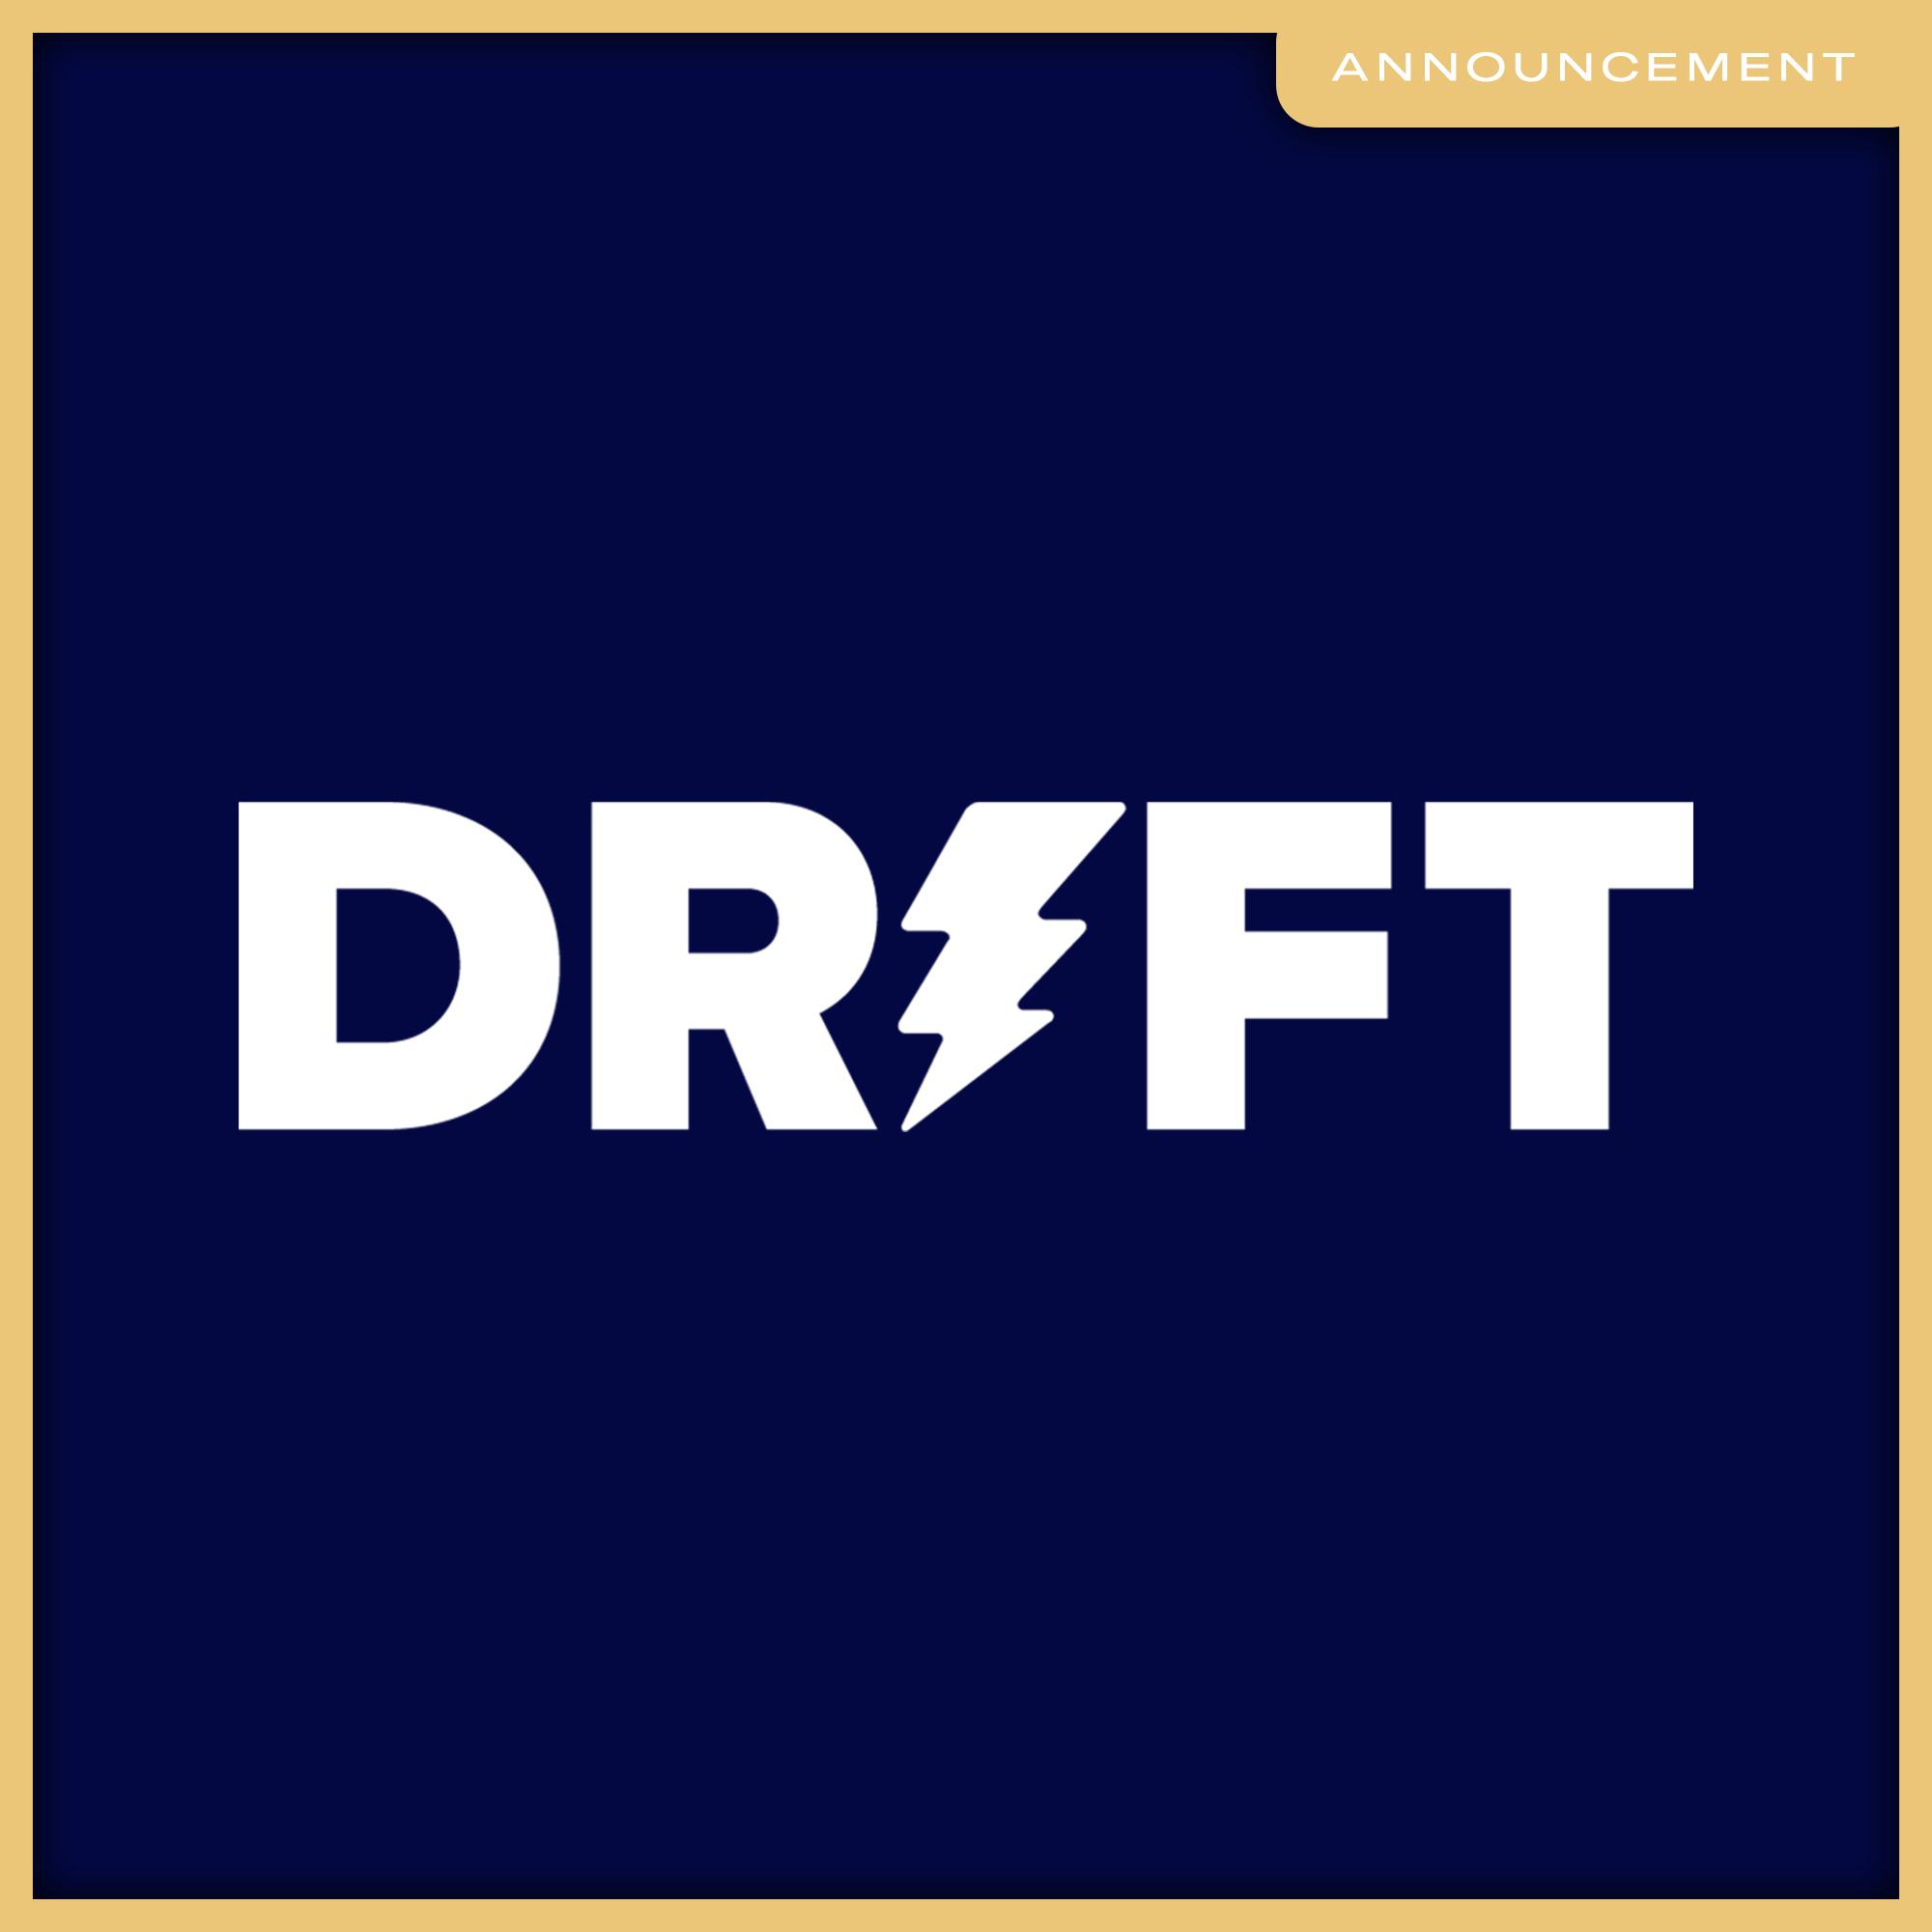 03-Announcement--Casted-Launches-Drift-Integration-